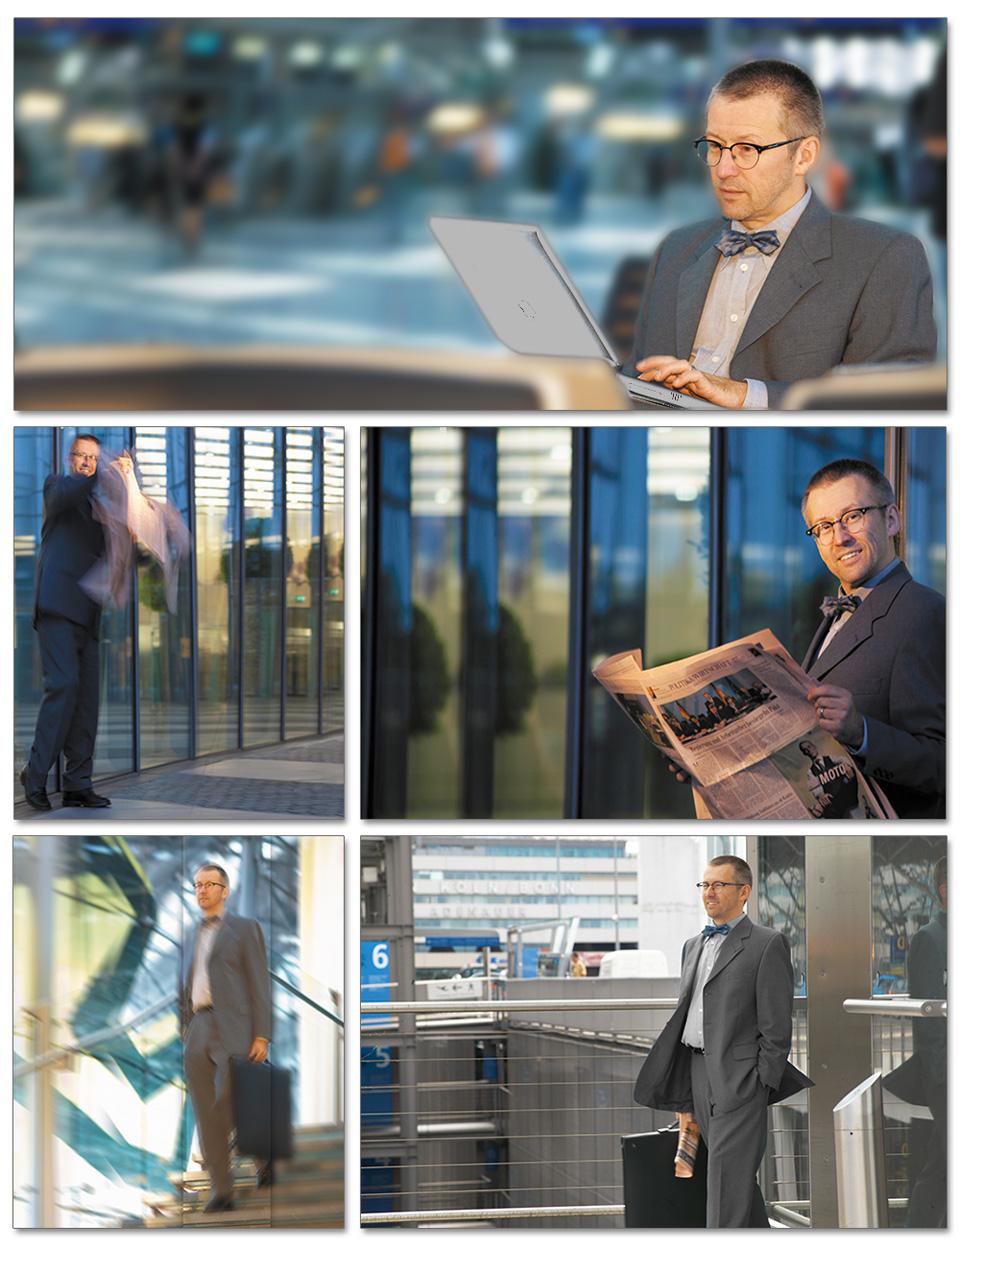 Business-Portraits, Personality-Shooting, Bussiness-Reportagen @blickfang2 fotostudios filmstudios Weinheim und Andernach